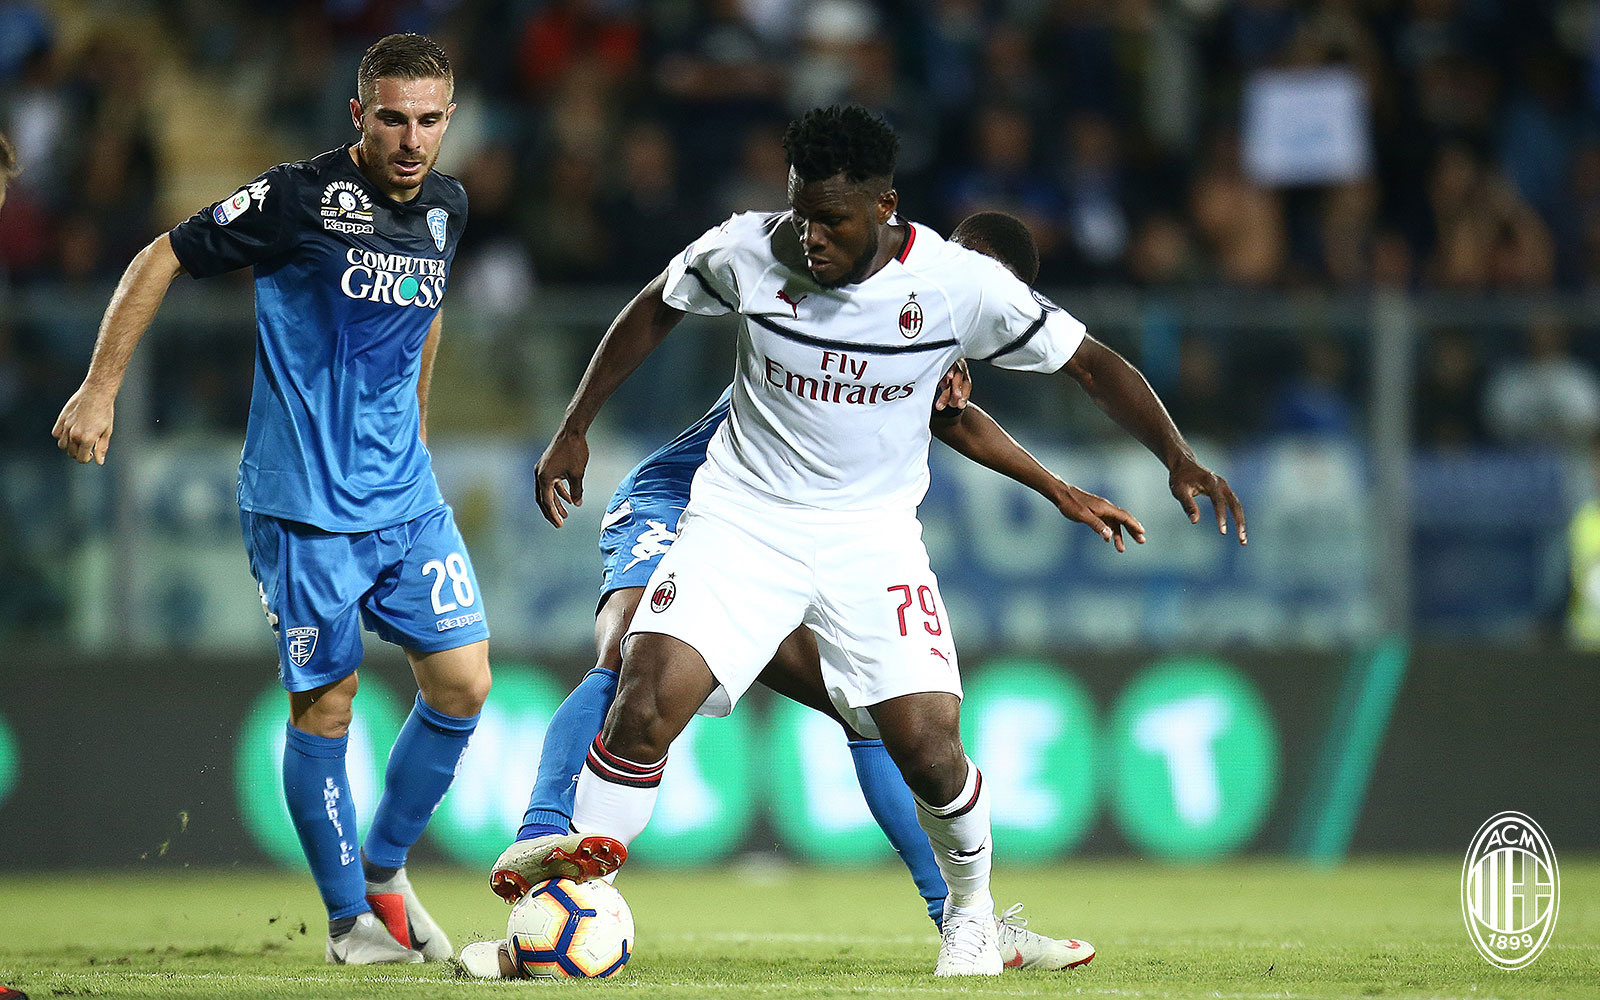 Franck Kessié during Empoli-Milan at Stadio Carlo Castellani on September 27, 2018. (@acmilan.com)